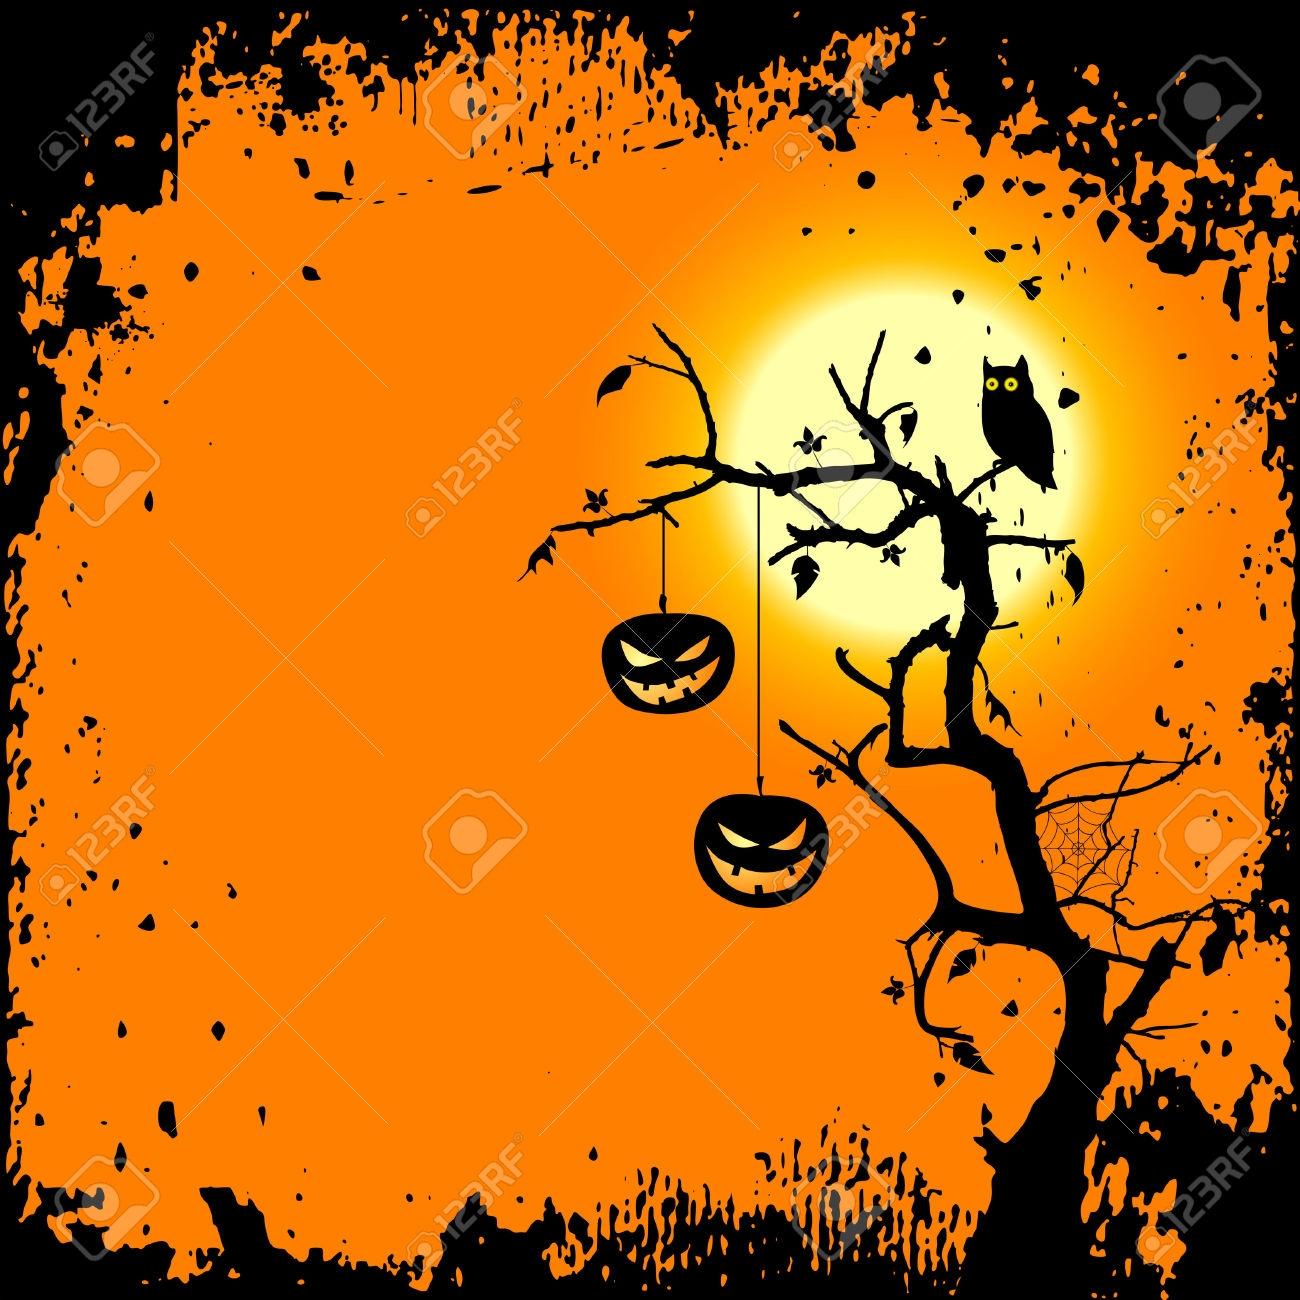 free halloween background images wallpapersafari